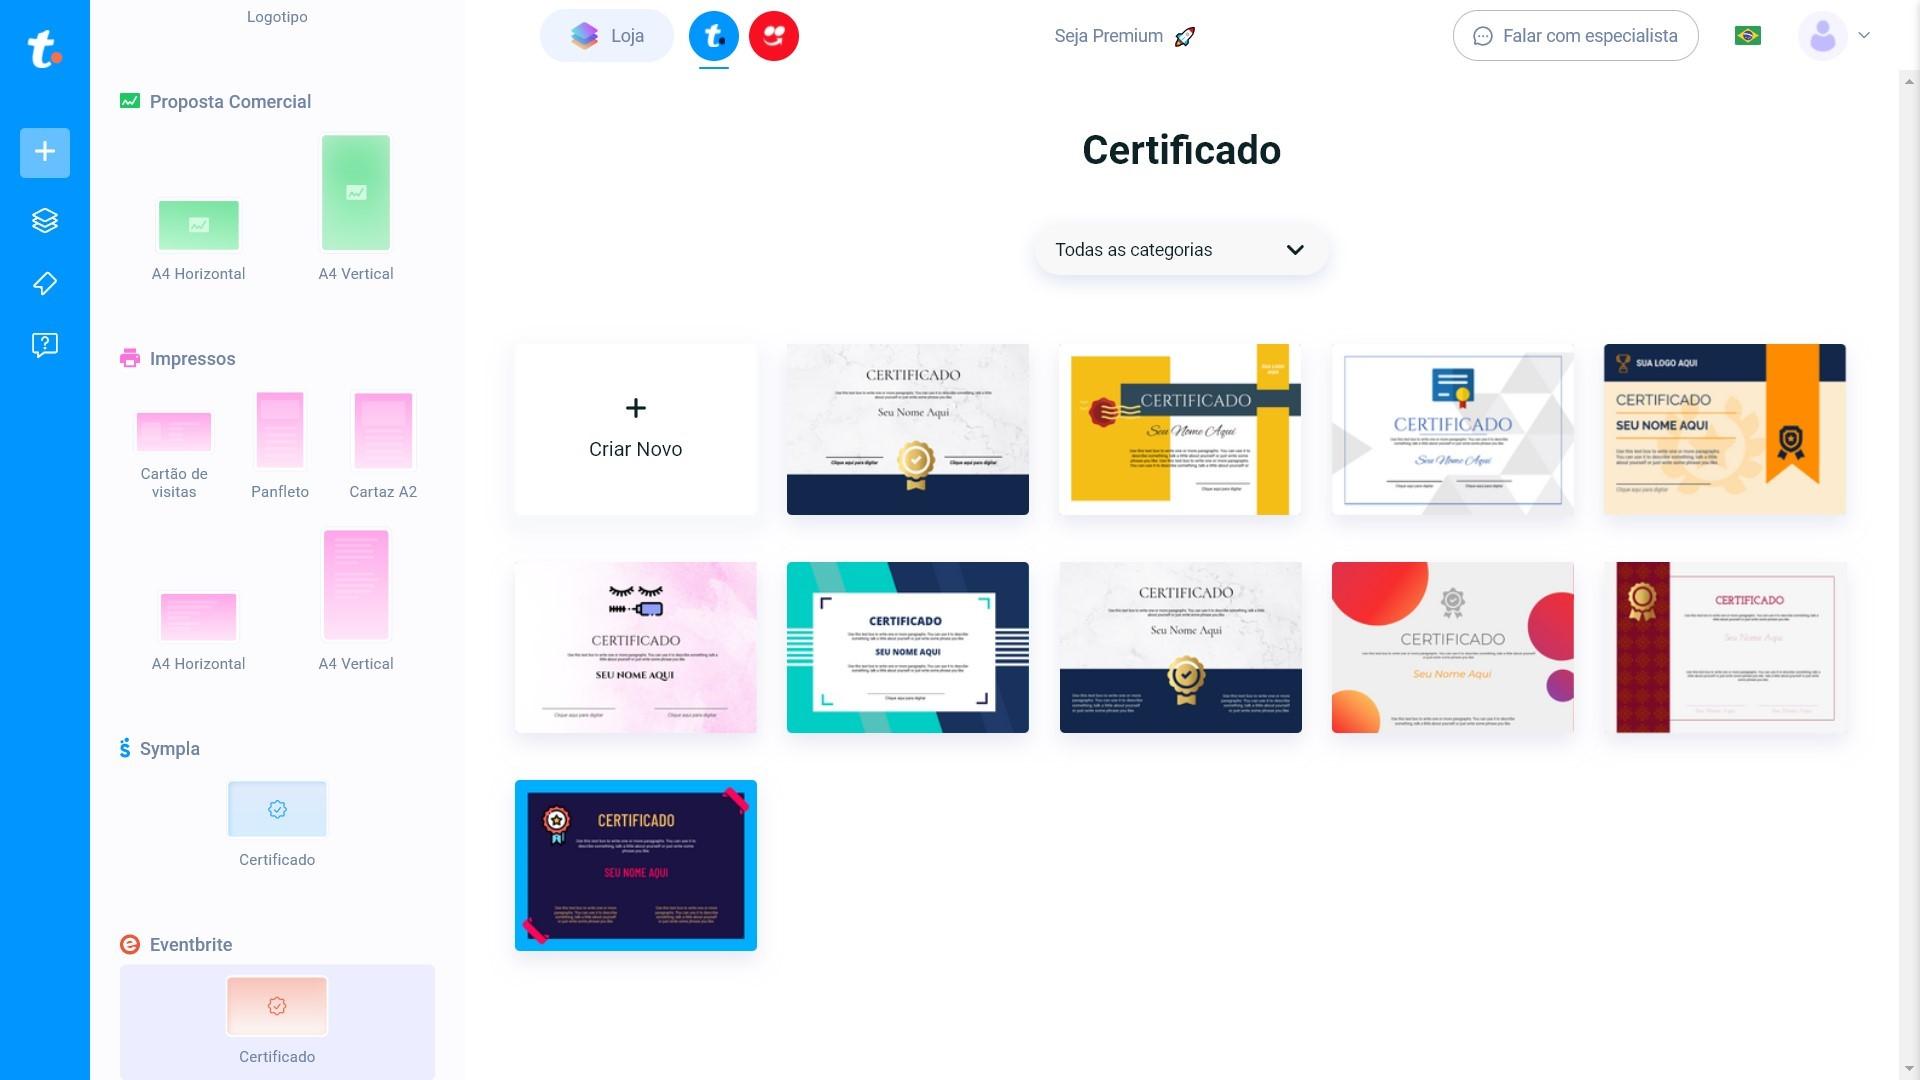 modelos certificado curso trakto - Modelos de certificado de curso online ou presencial prontos para usar